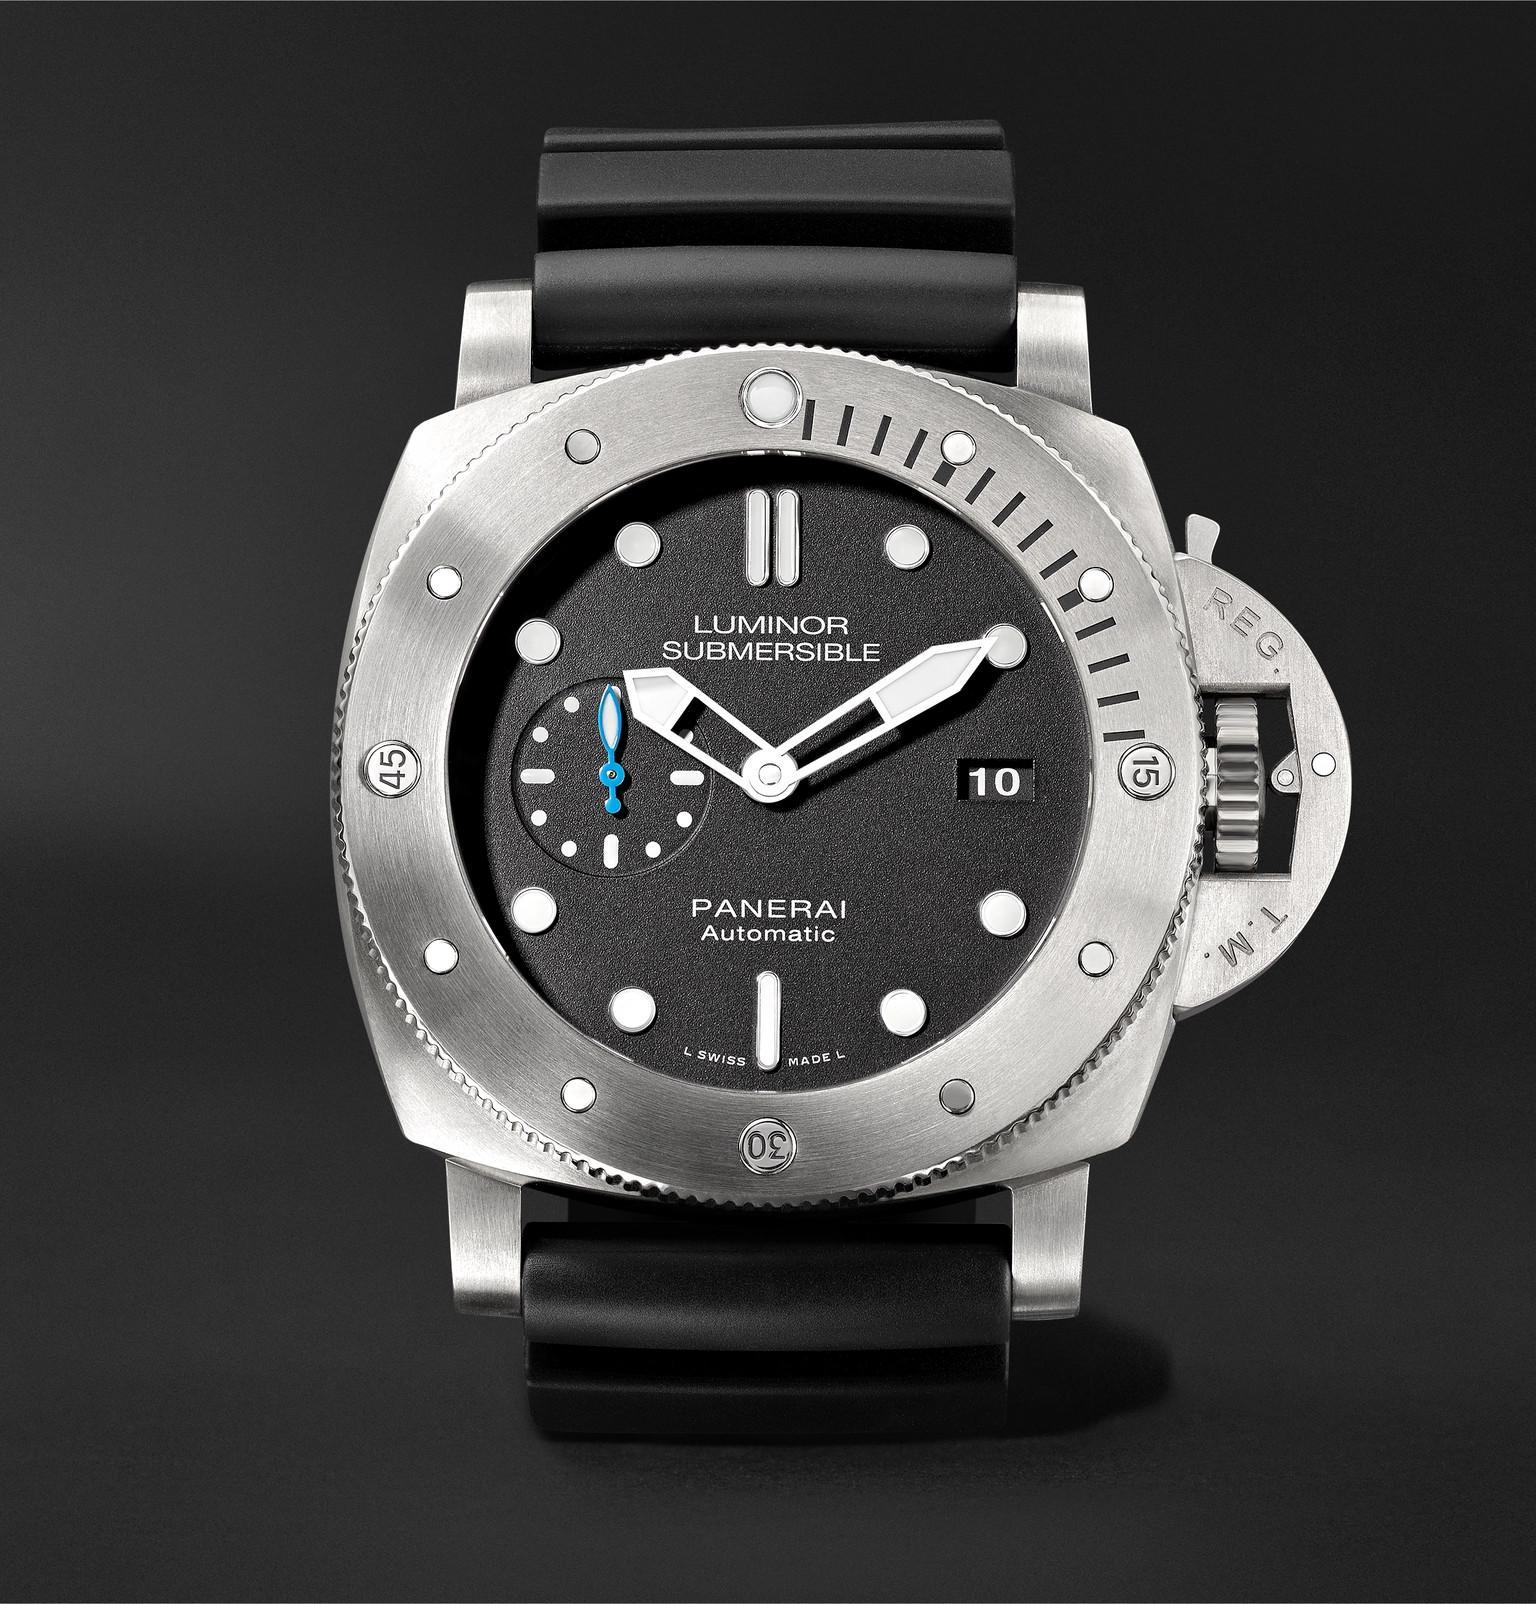 d5a9148df290 Officine Panerai. Men s Black Luminor Submersible 1950 3 Days Automatic  47mm Titanium ...